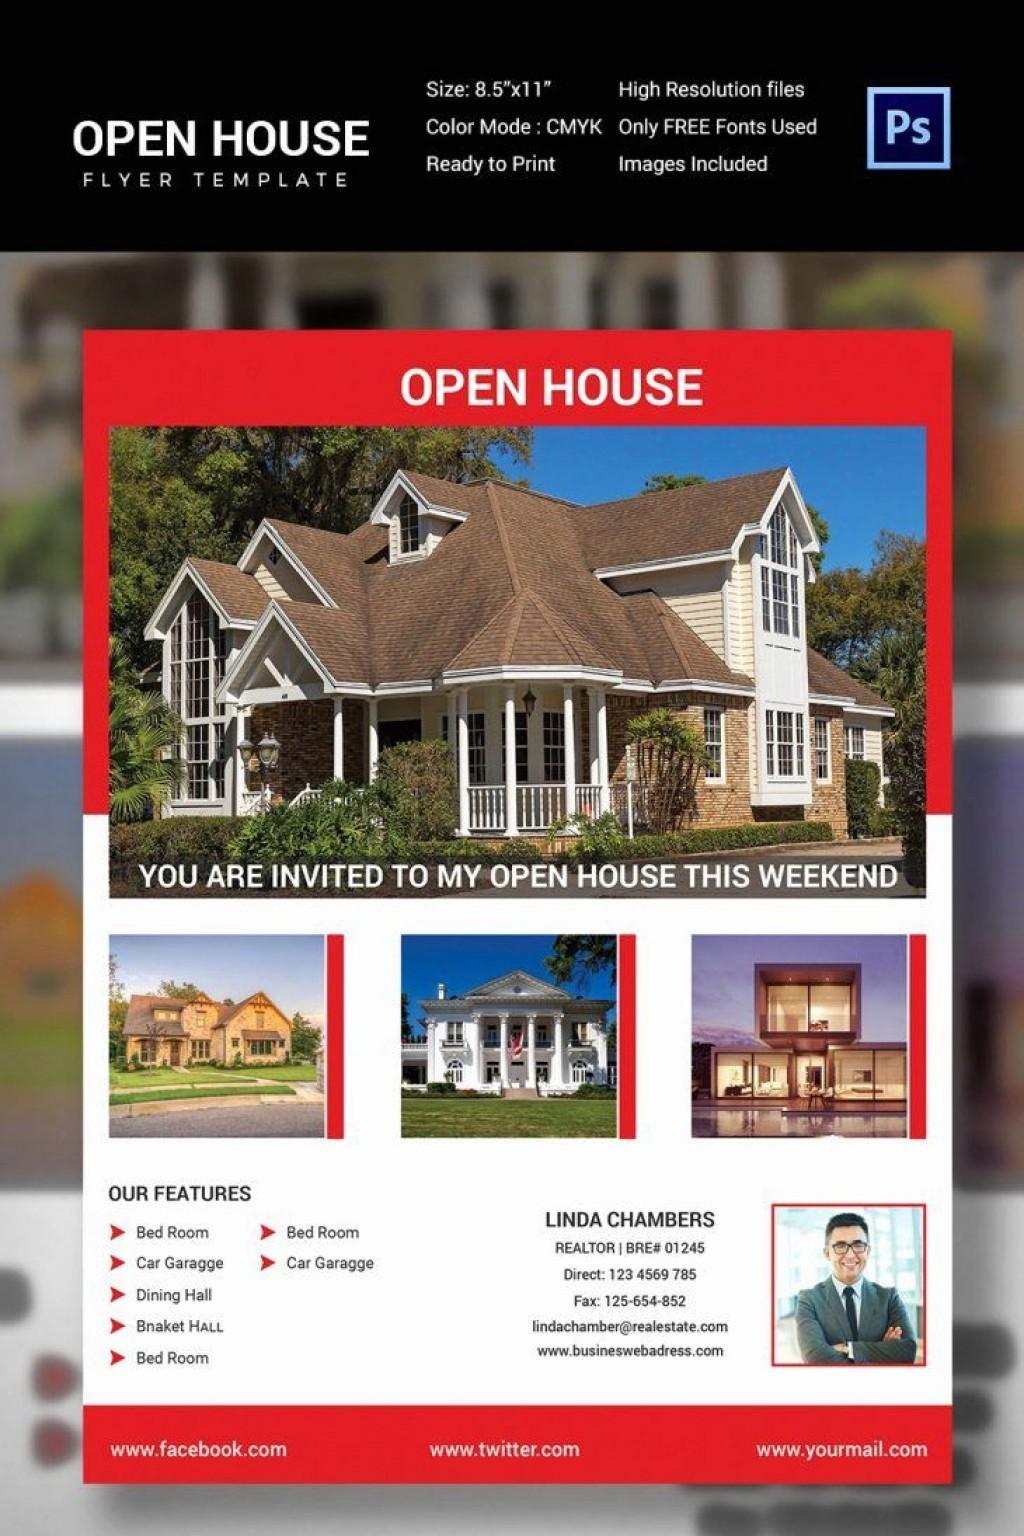 000 Imposing Open House Flyer Template Free Example  Holiday Preschool School MicrosoftLarge